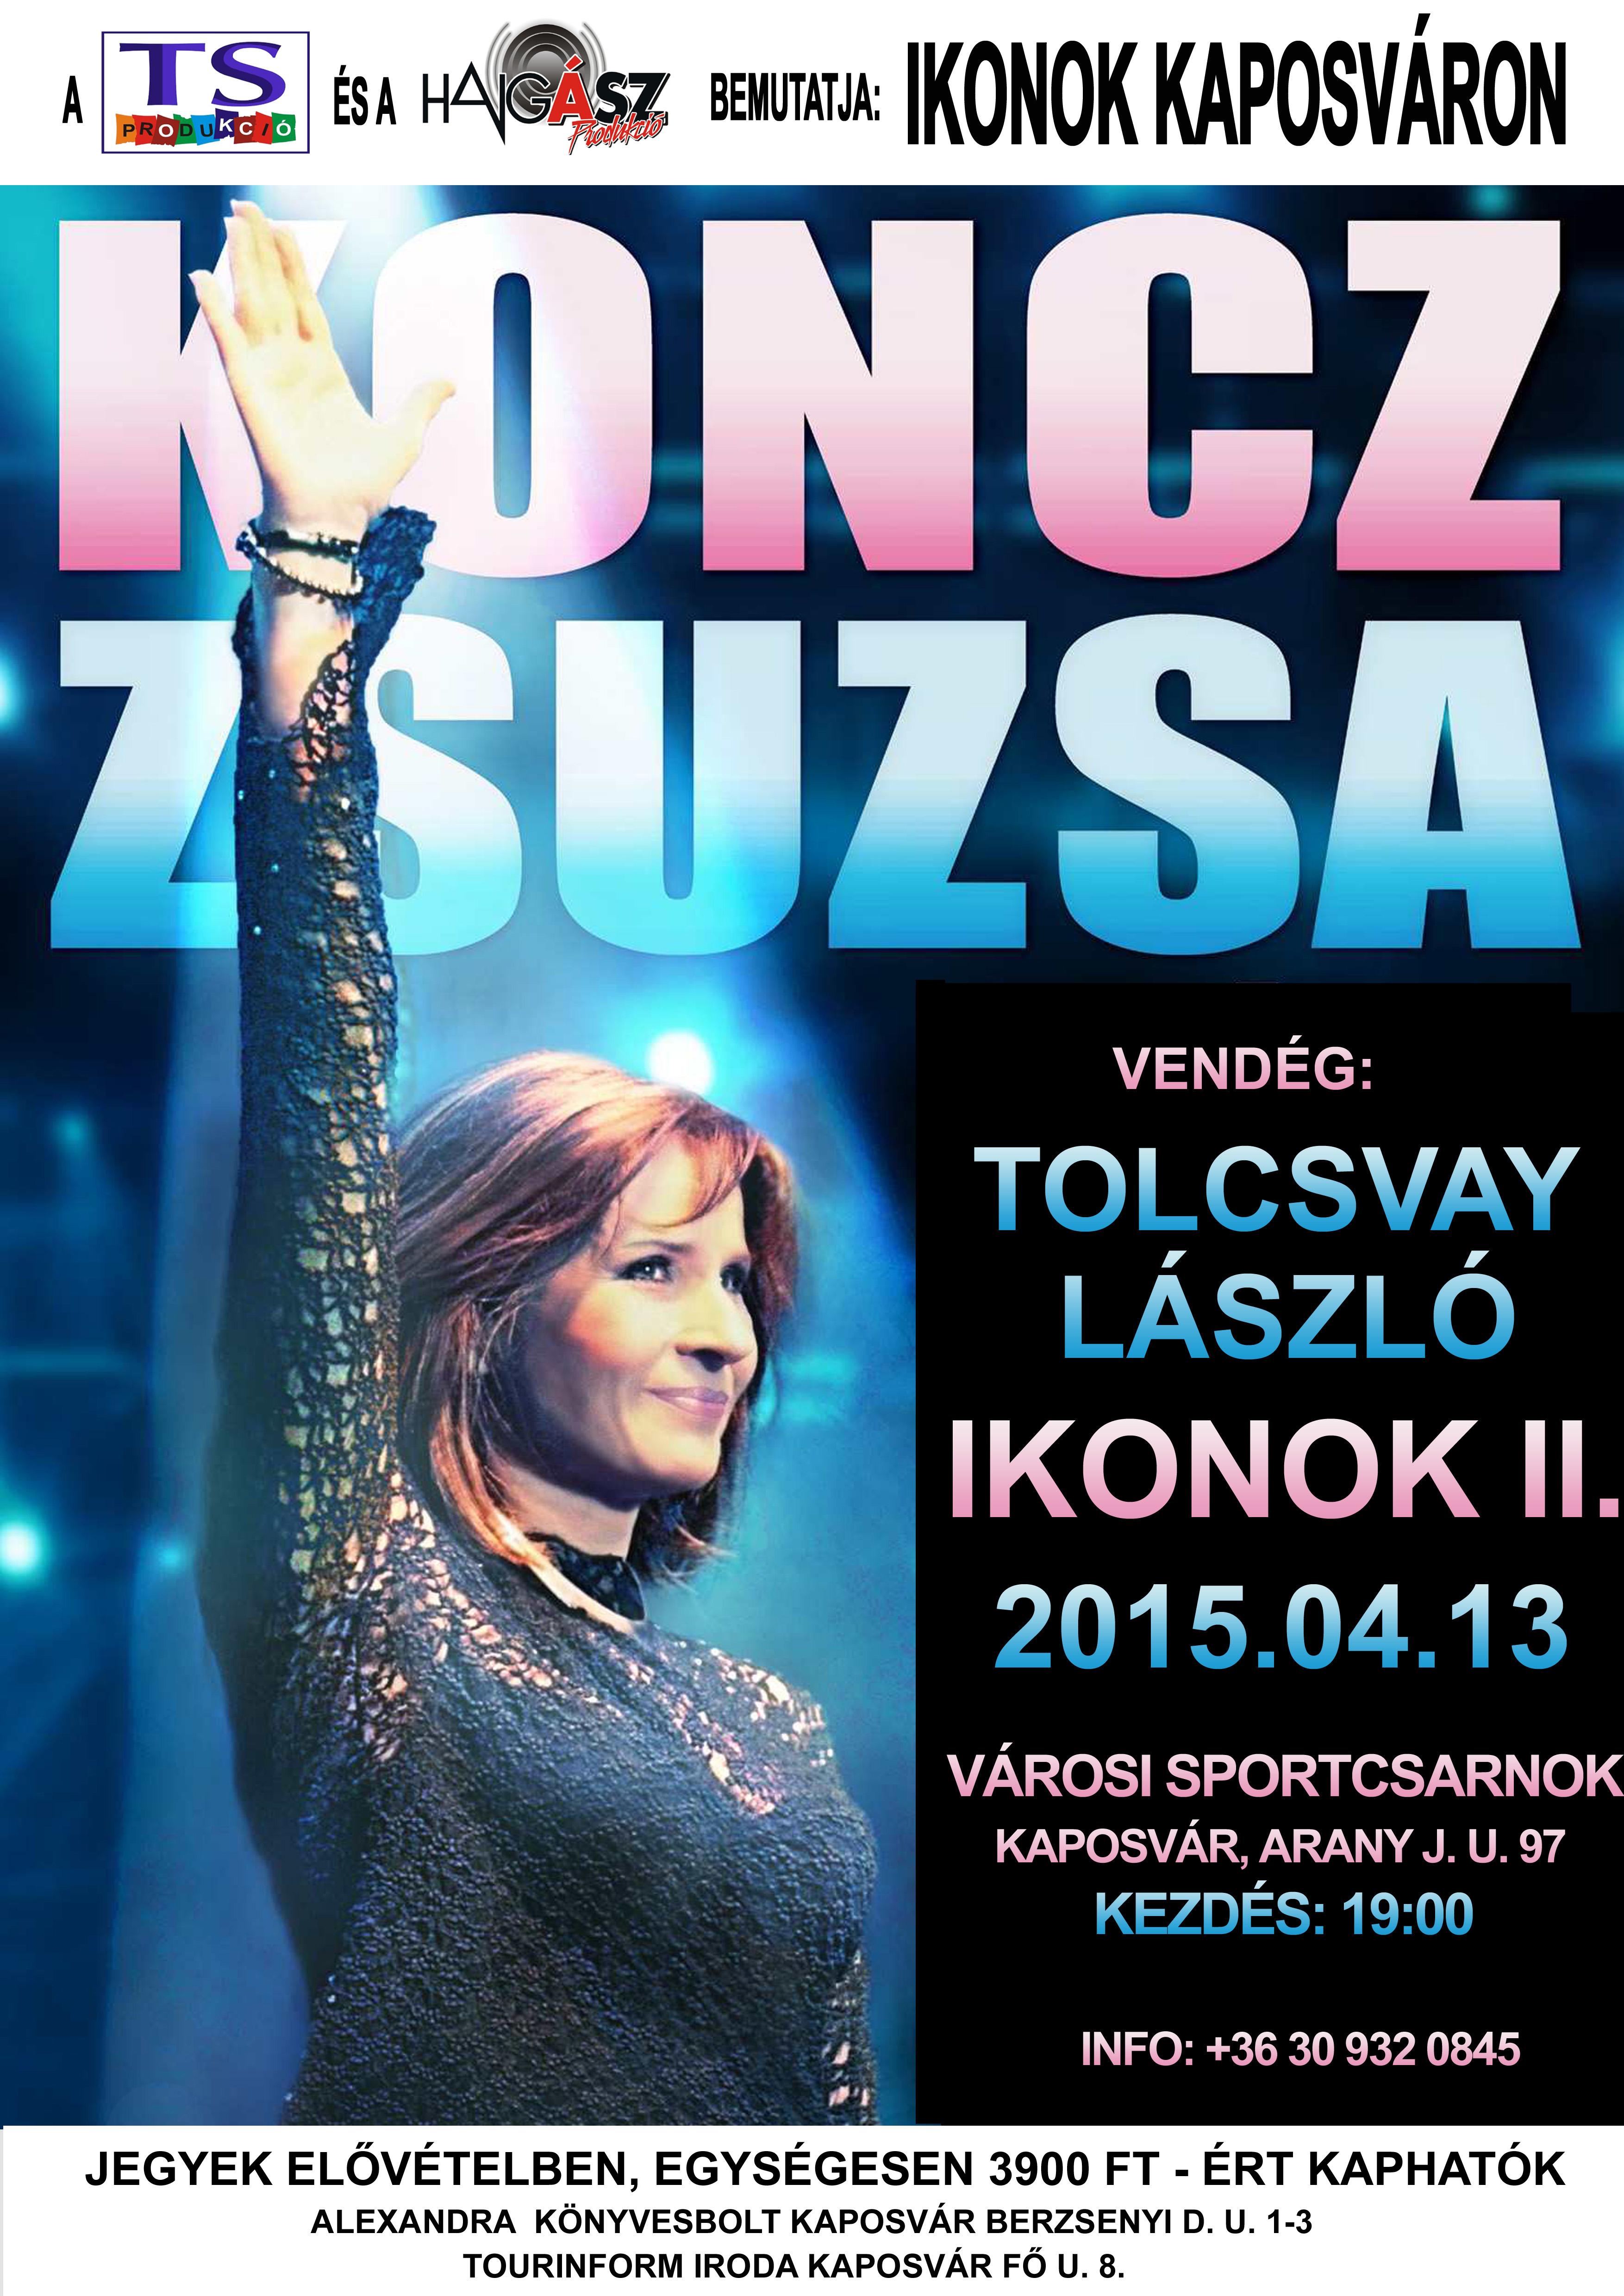 Koncz_Zsuzsa_ikonok